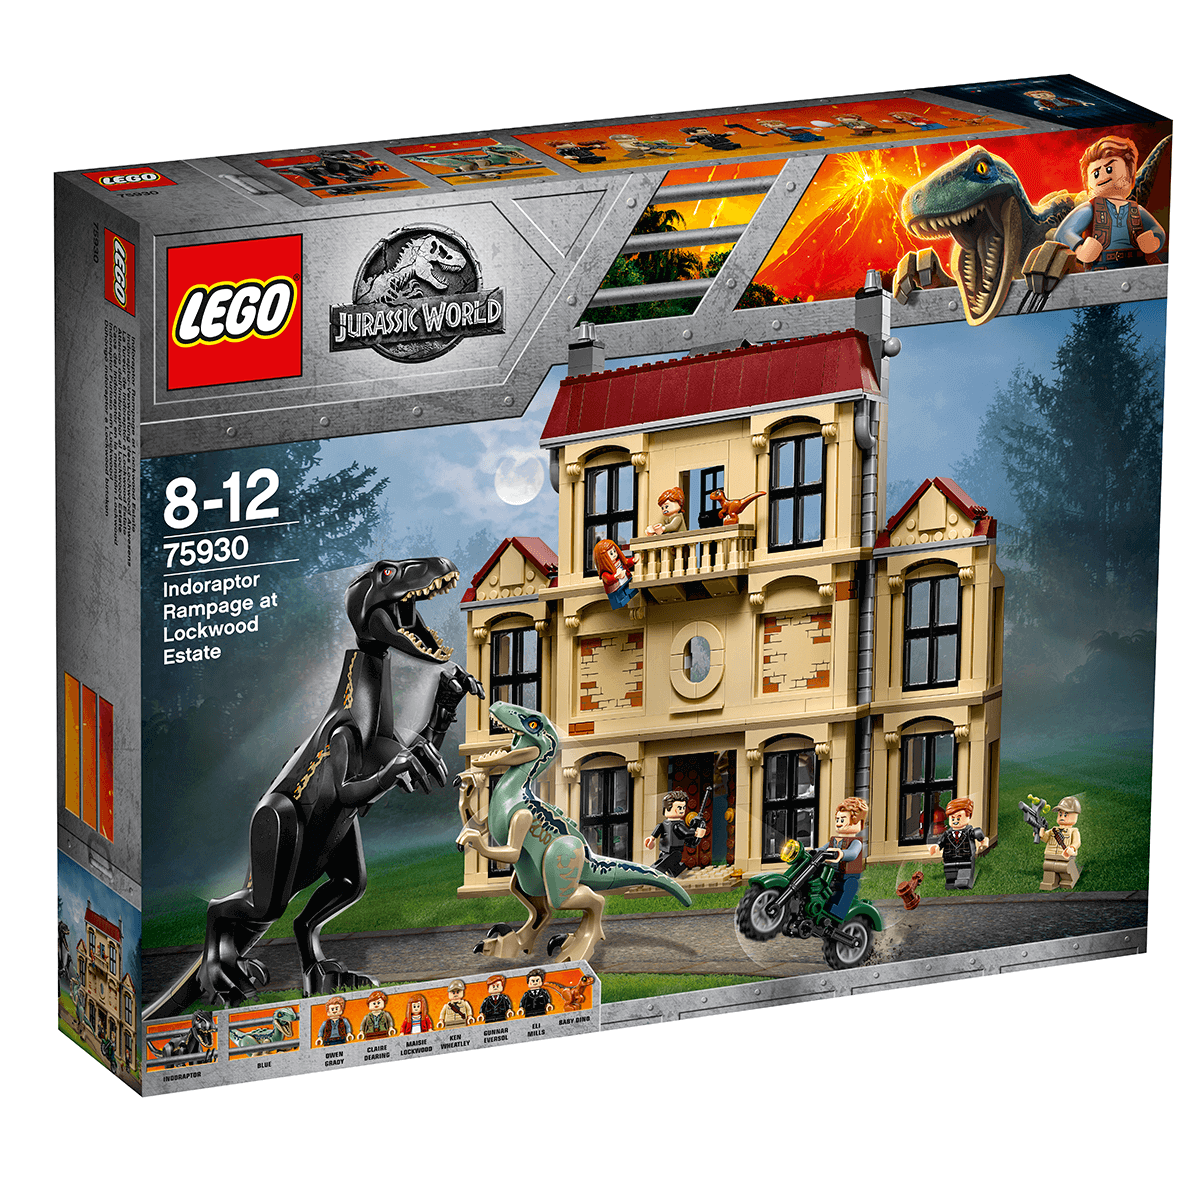 5+ NEW! LEGO 75930 Jurassic World Claire Dearing Minifigure